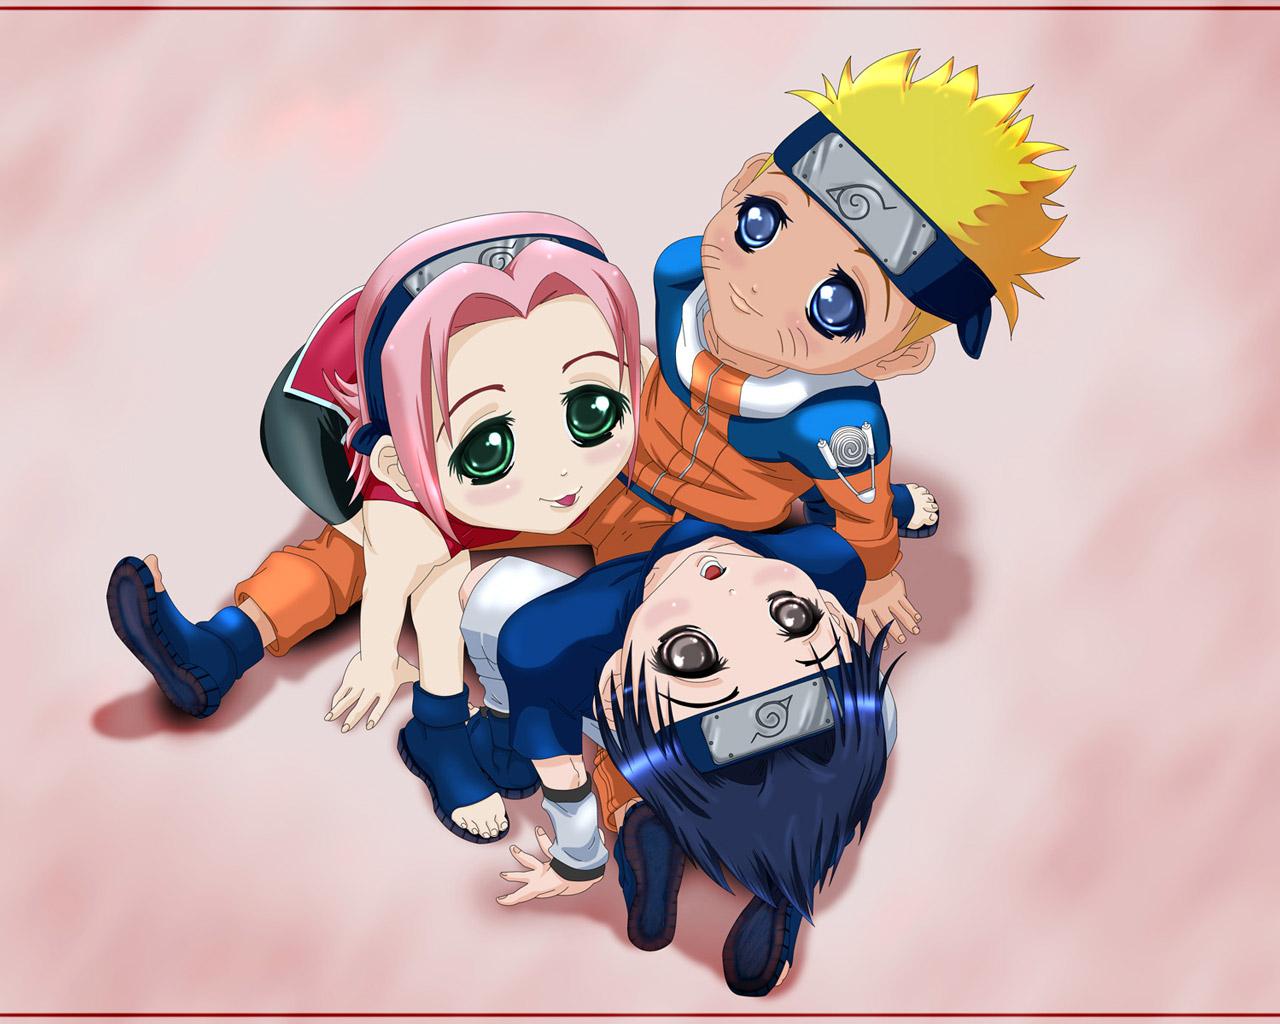 You are viewing the Groups wallpaper named Naruto Sakura Sasuke It 1280x1024